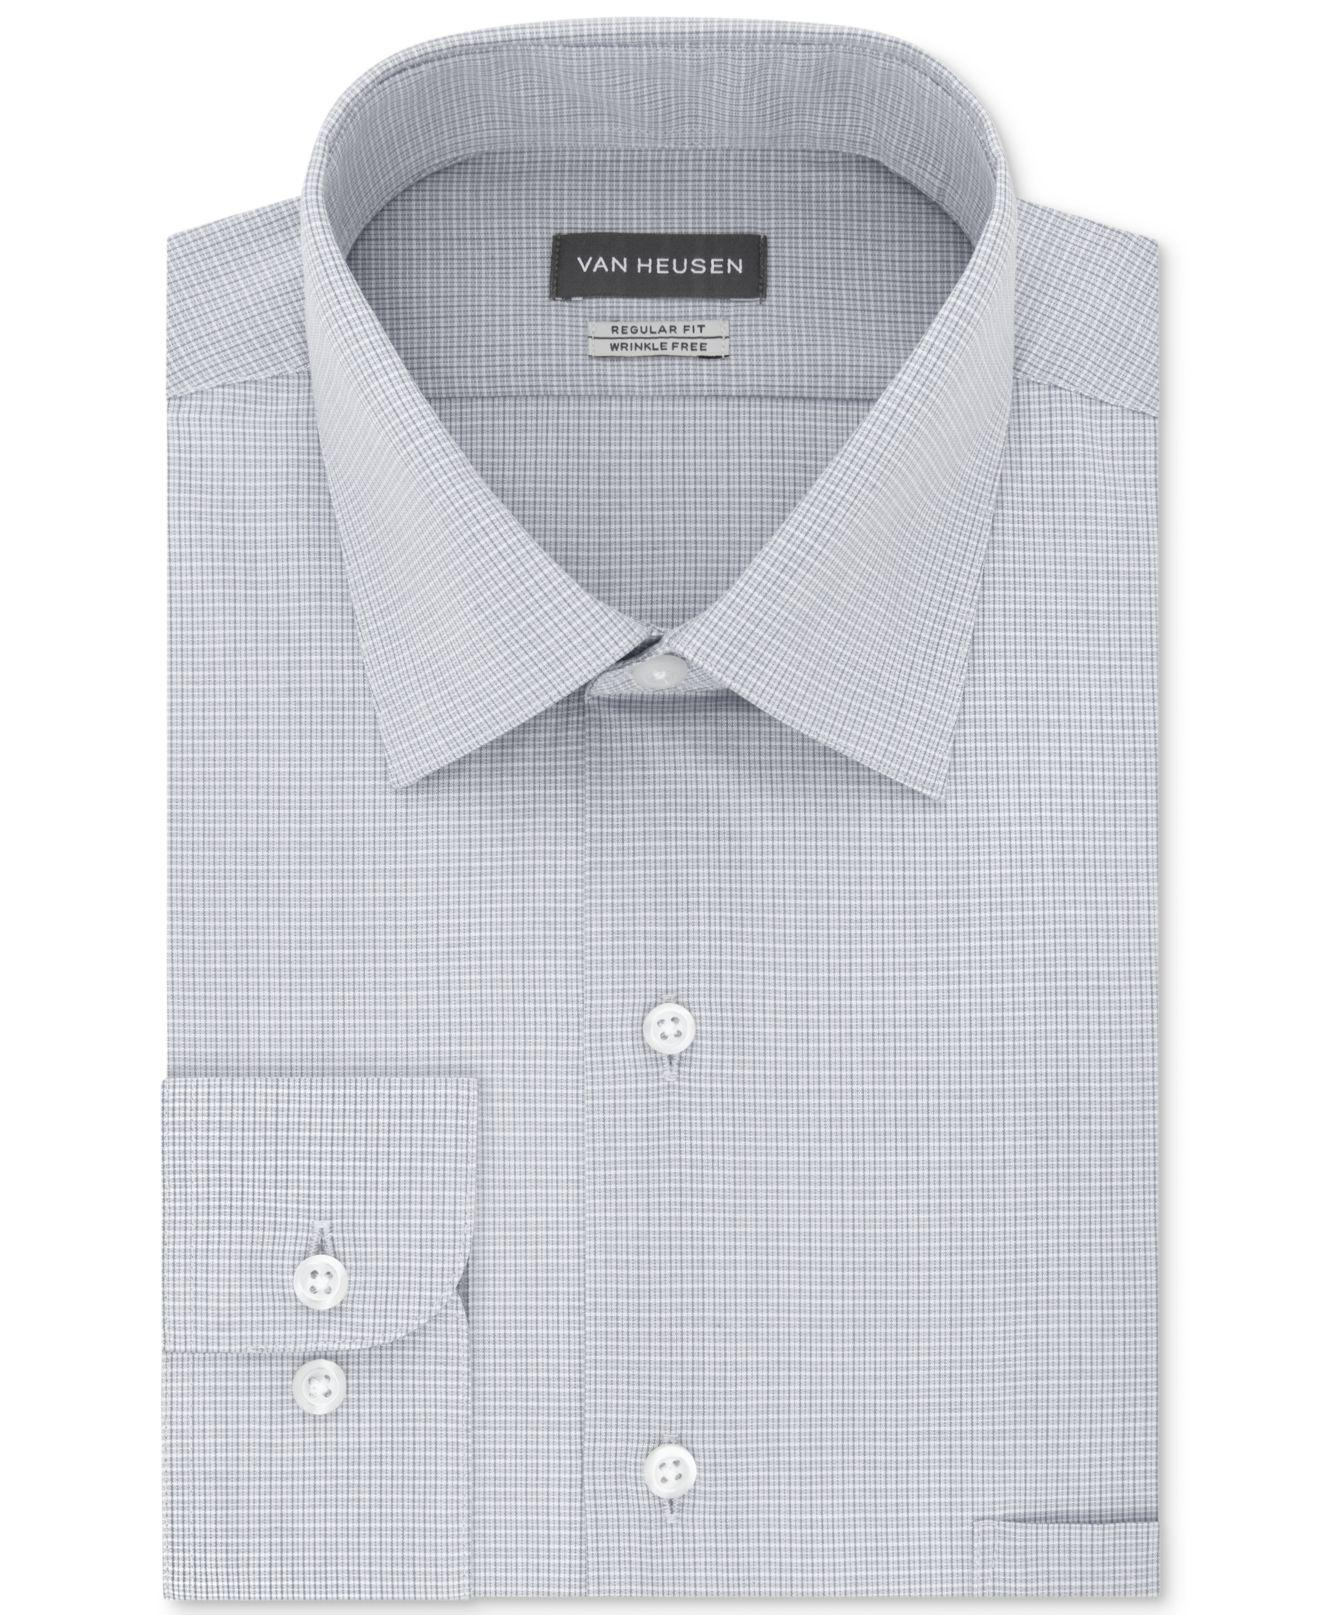 9f99711b56c Van Heusen - Blue Classic regular Fit Wrinkle Free Solid Micro-check Dress  Shirt. View fullscreen